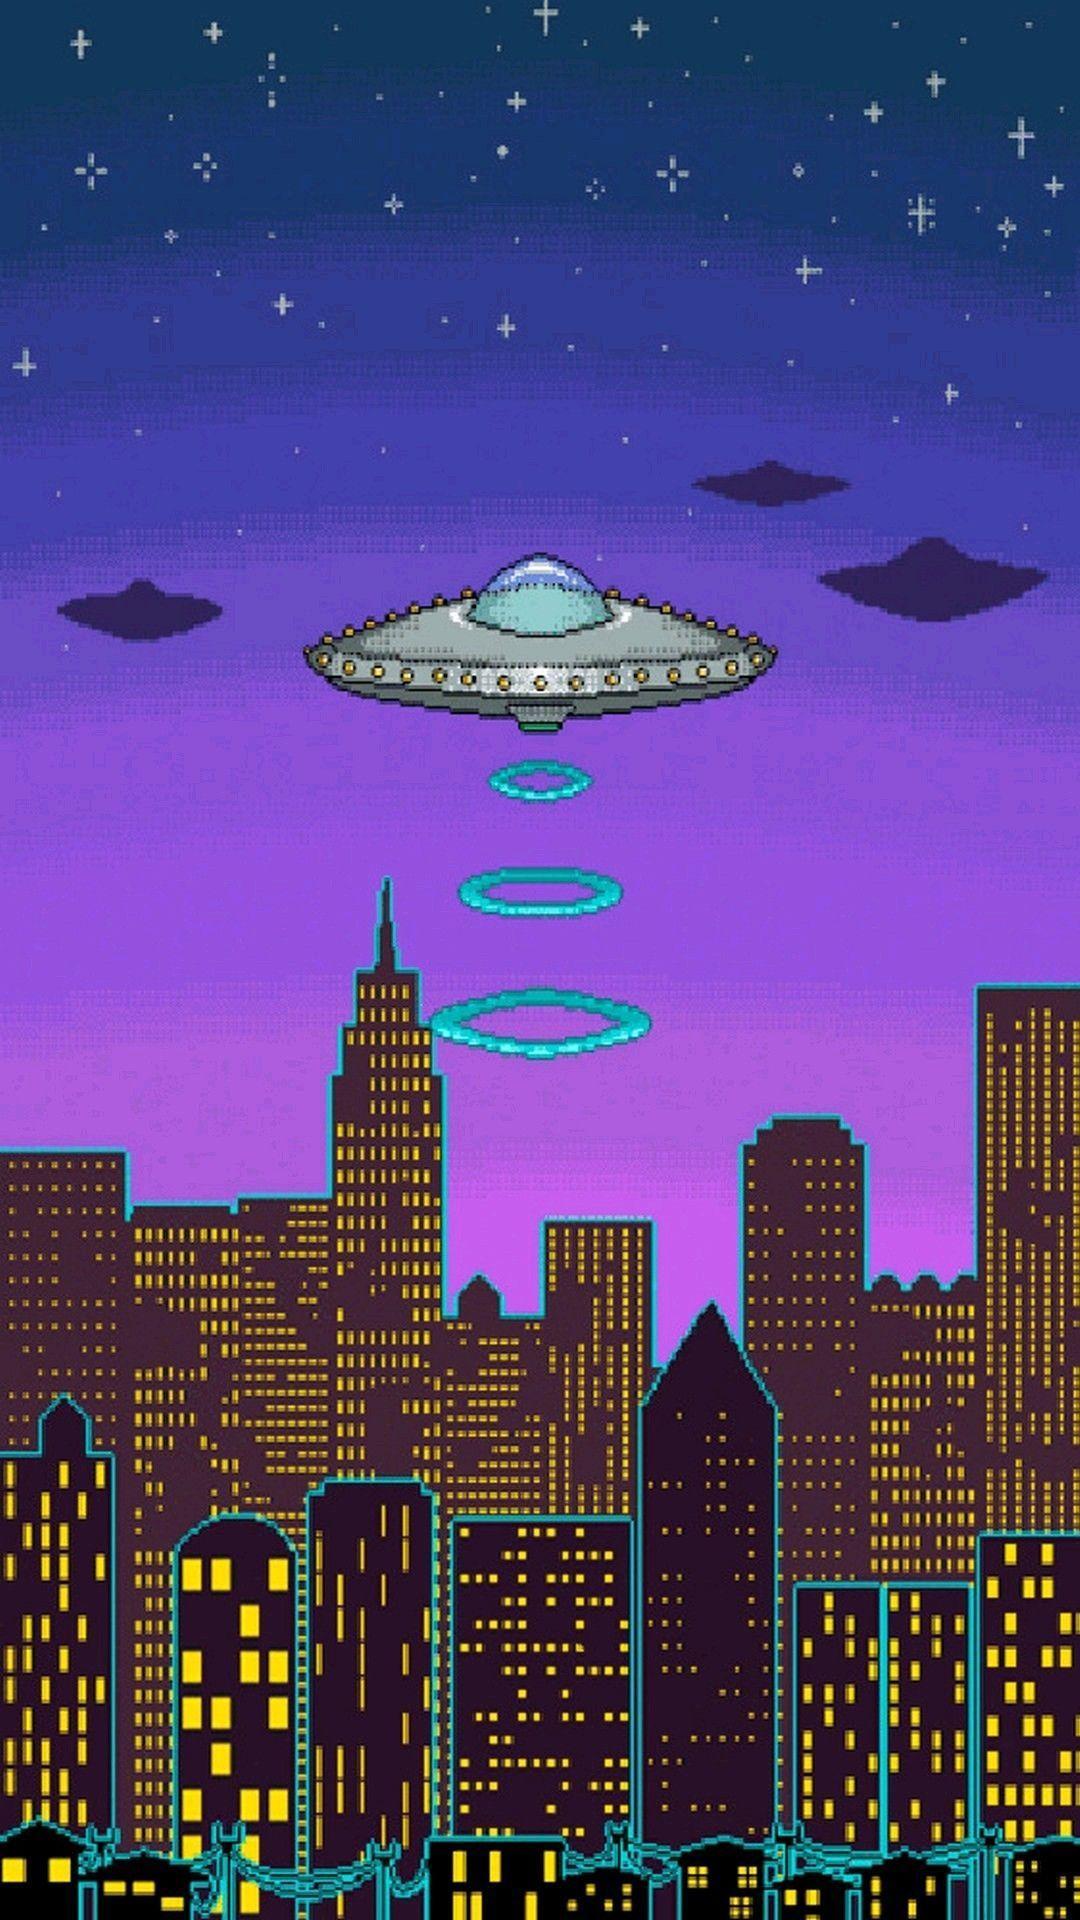 Alien Vaporwave Aesthetic Wallpapers Top Free Alien Vaporwave Aesthetic Backgrounds Wallpaperaccess